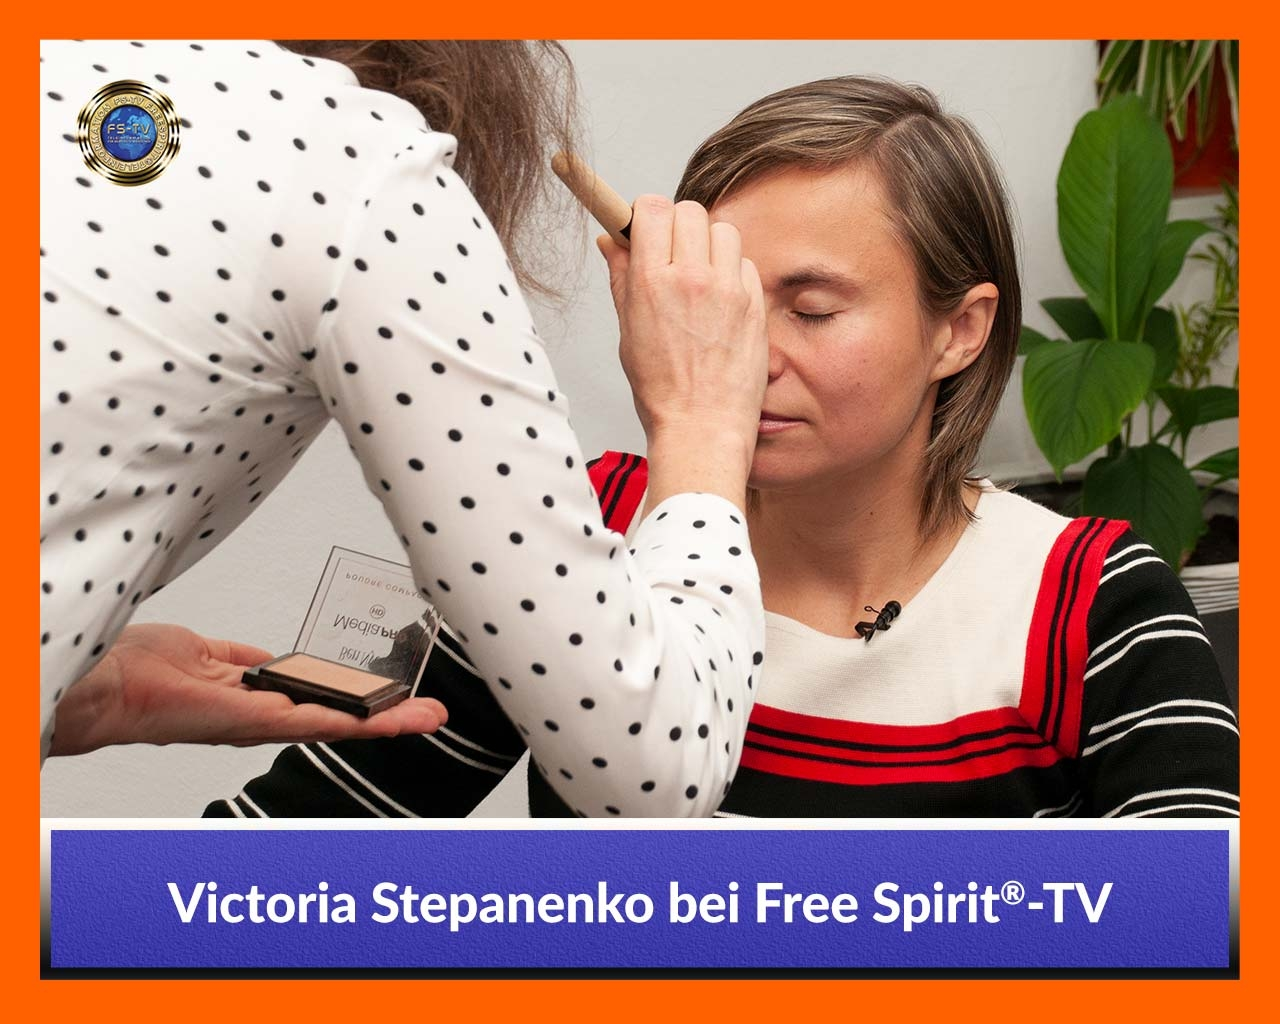 Galleriebild-Victoria-Stepanenko-04